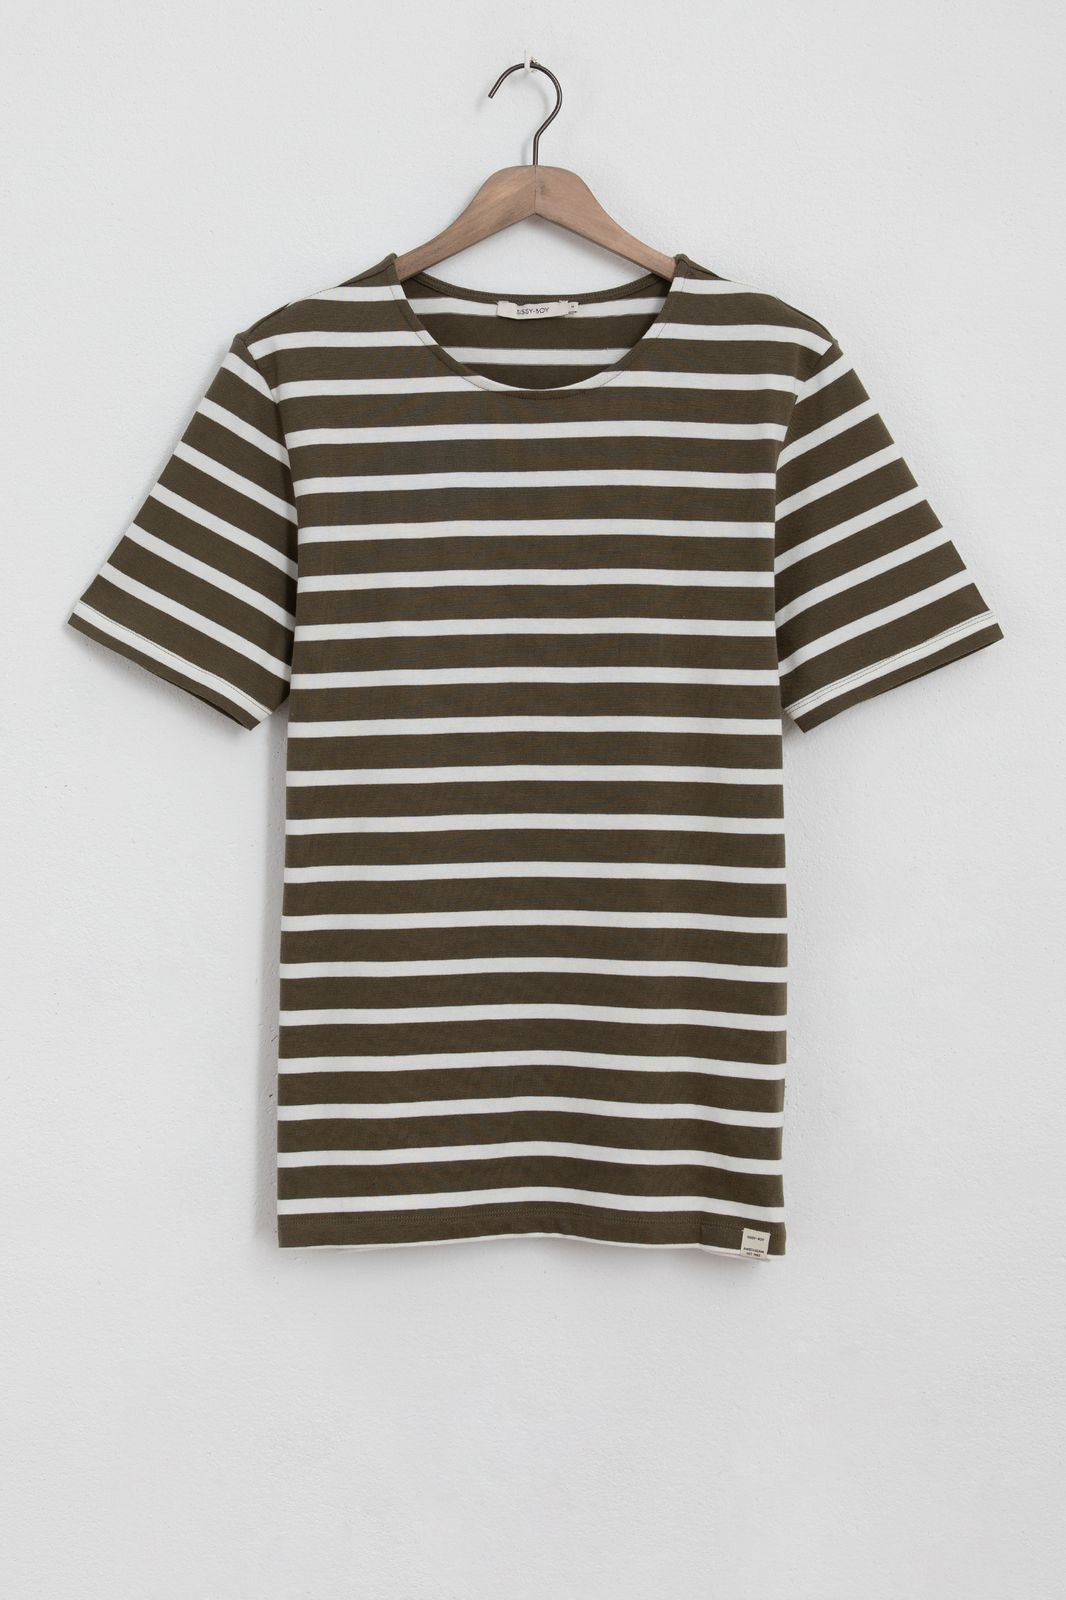 Donkergroen t-shirt gestreept